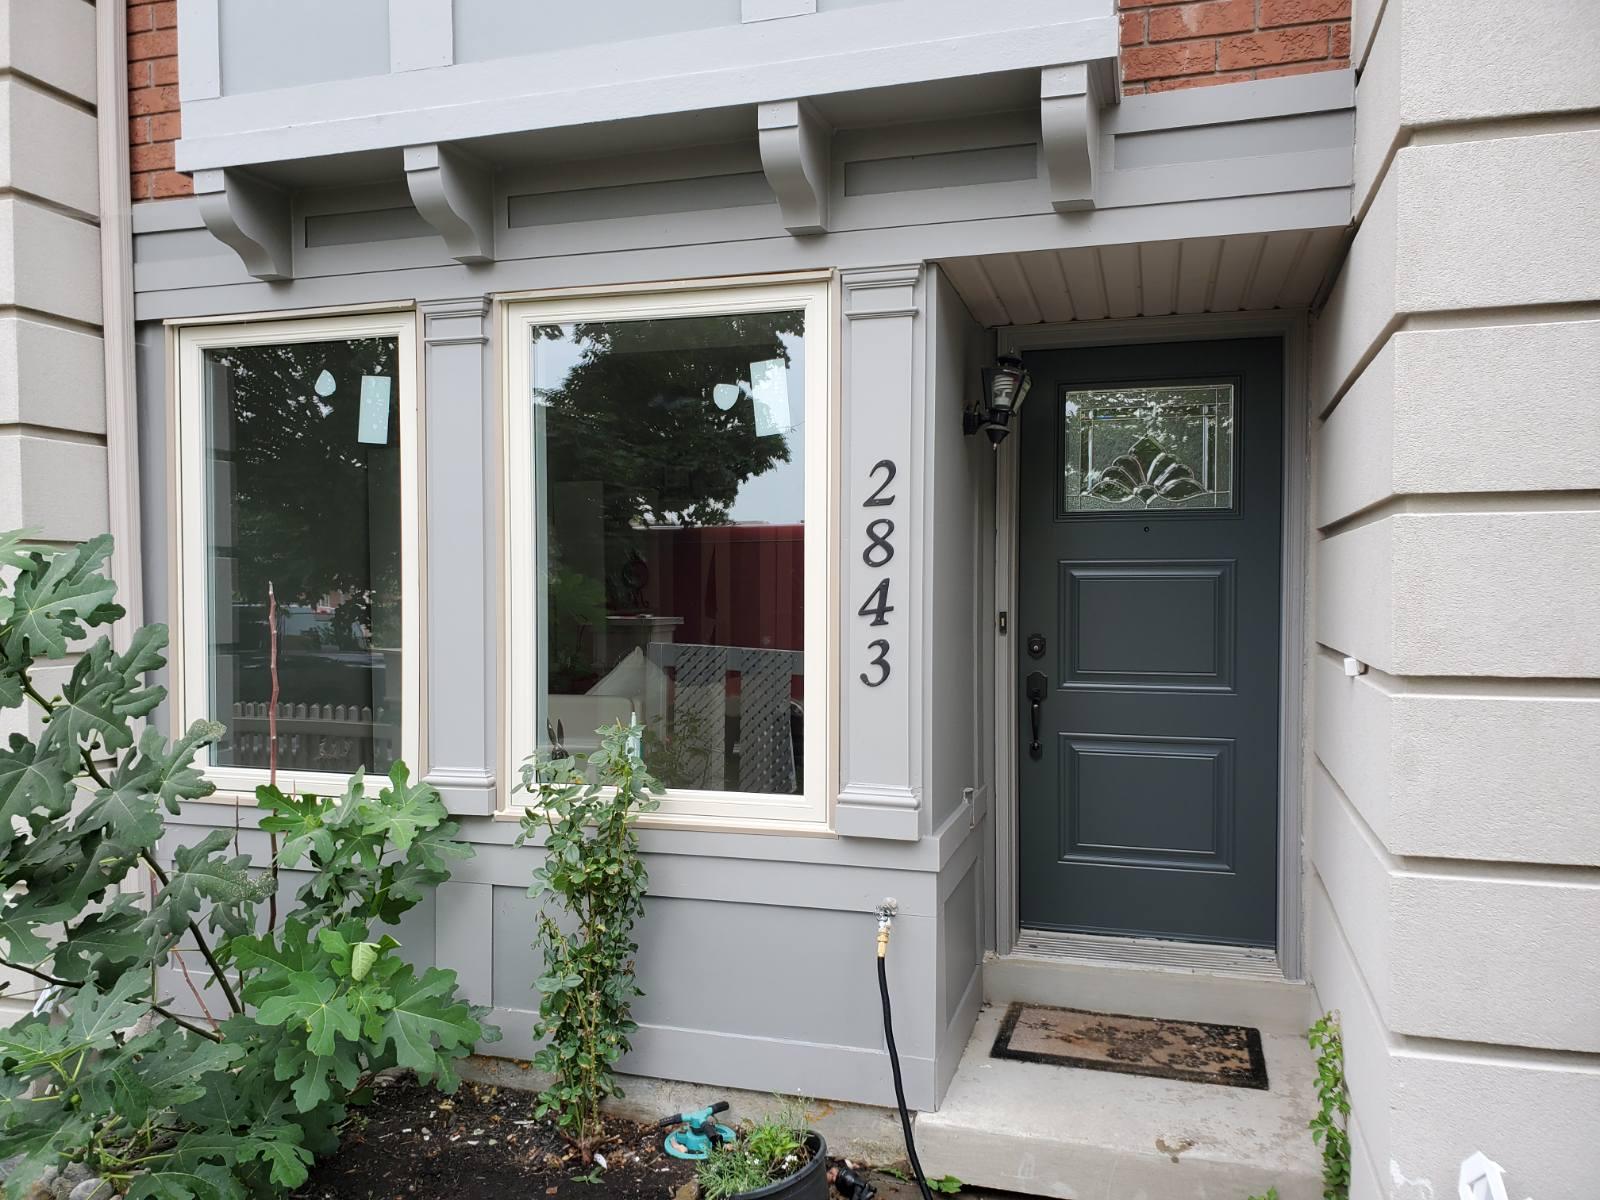 Fiberglass and Steel Door Installation and Replacement, PVC and Vinyl Windows, Woodbridge, Maple, Vaughan, King, Aurora, Nemwarket, Caledon, Nobleton, Kleinburg